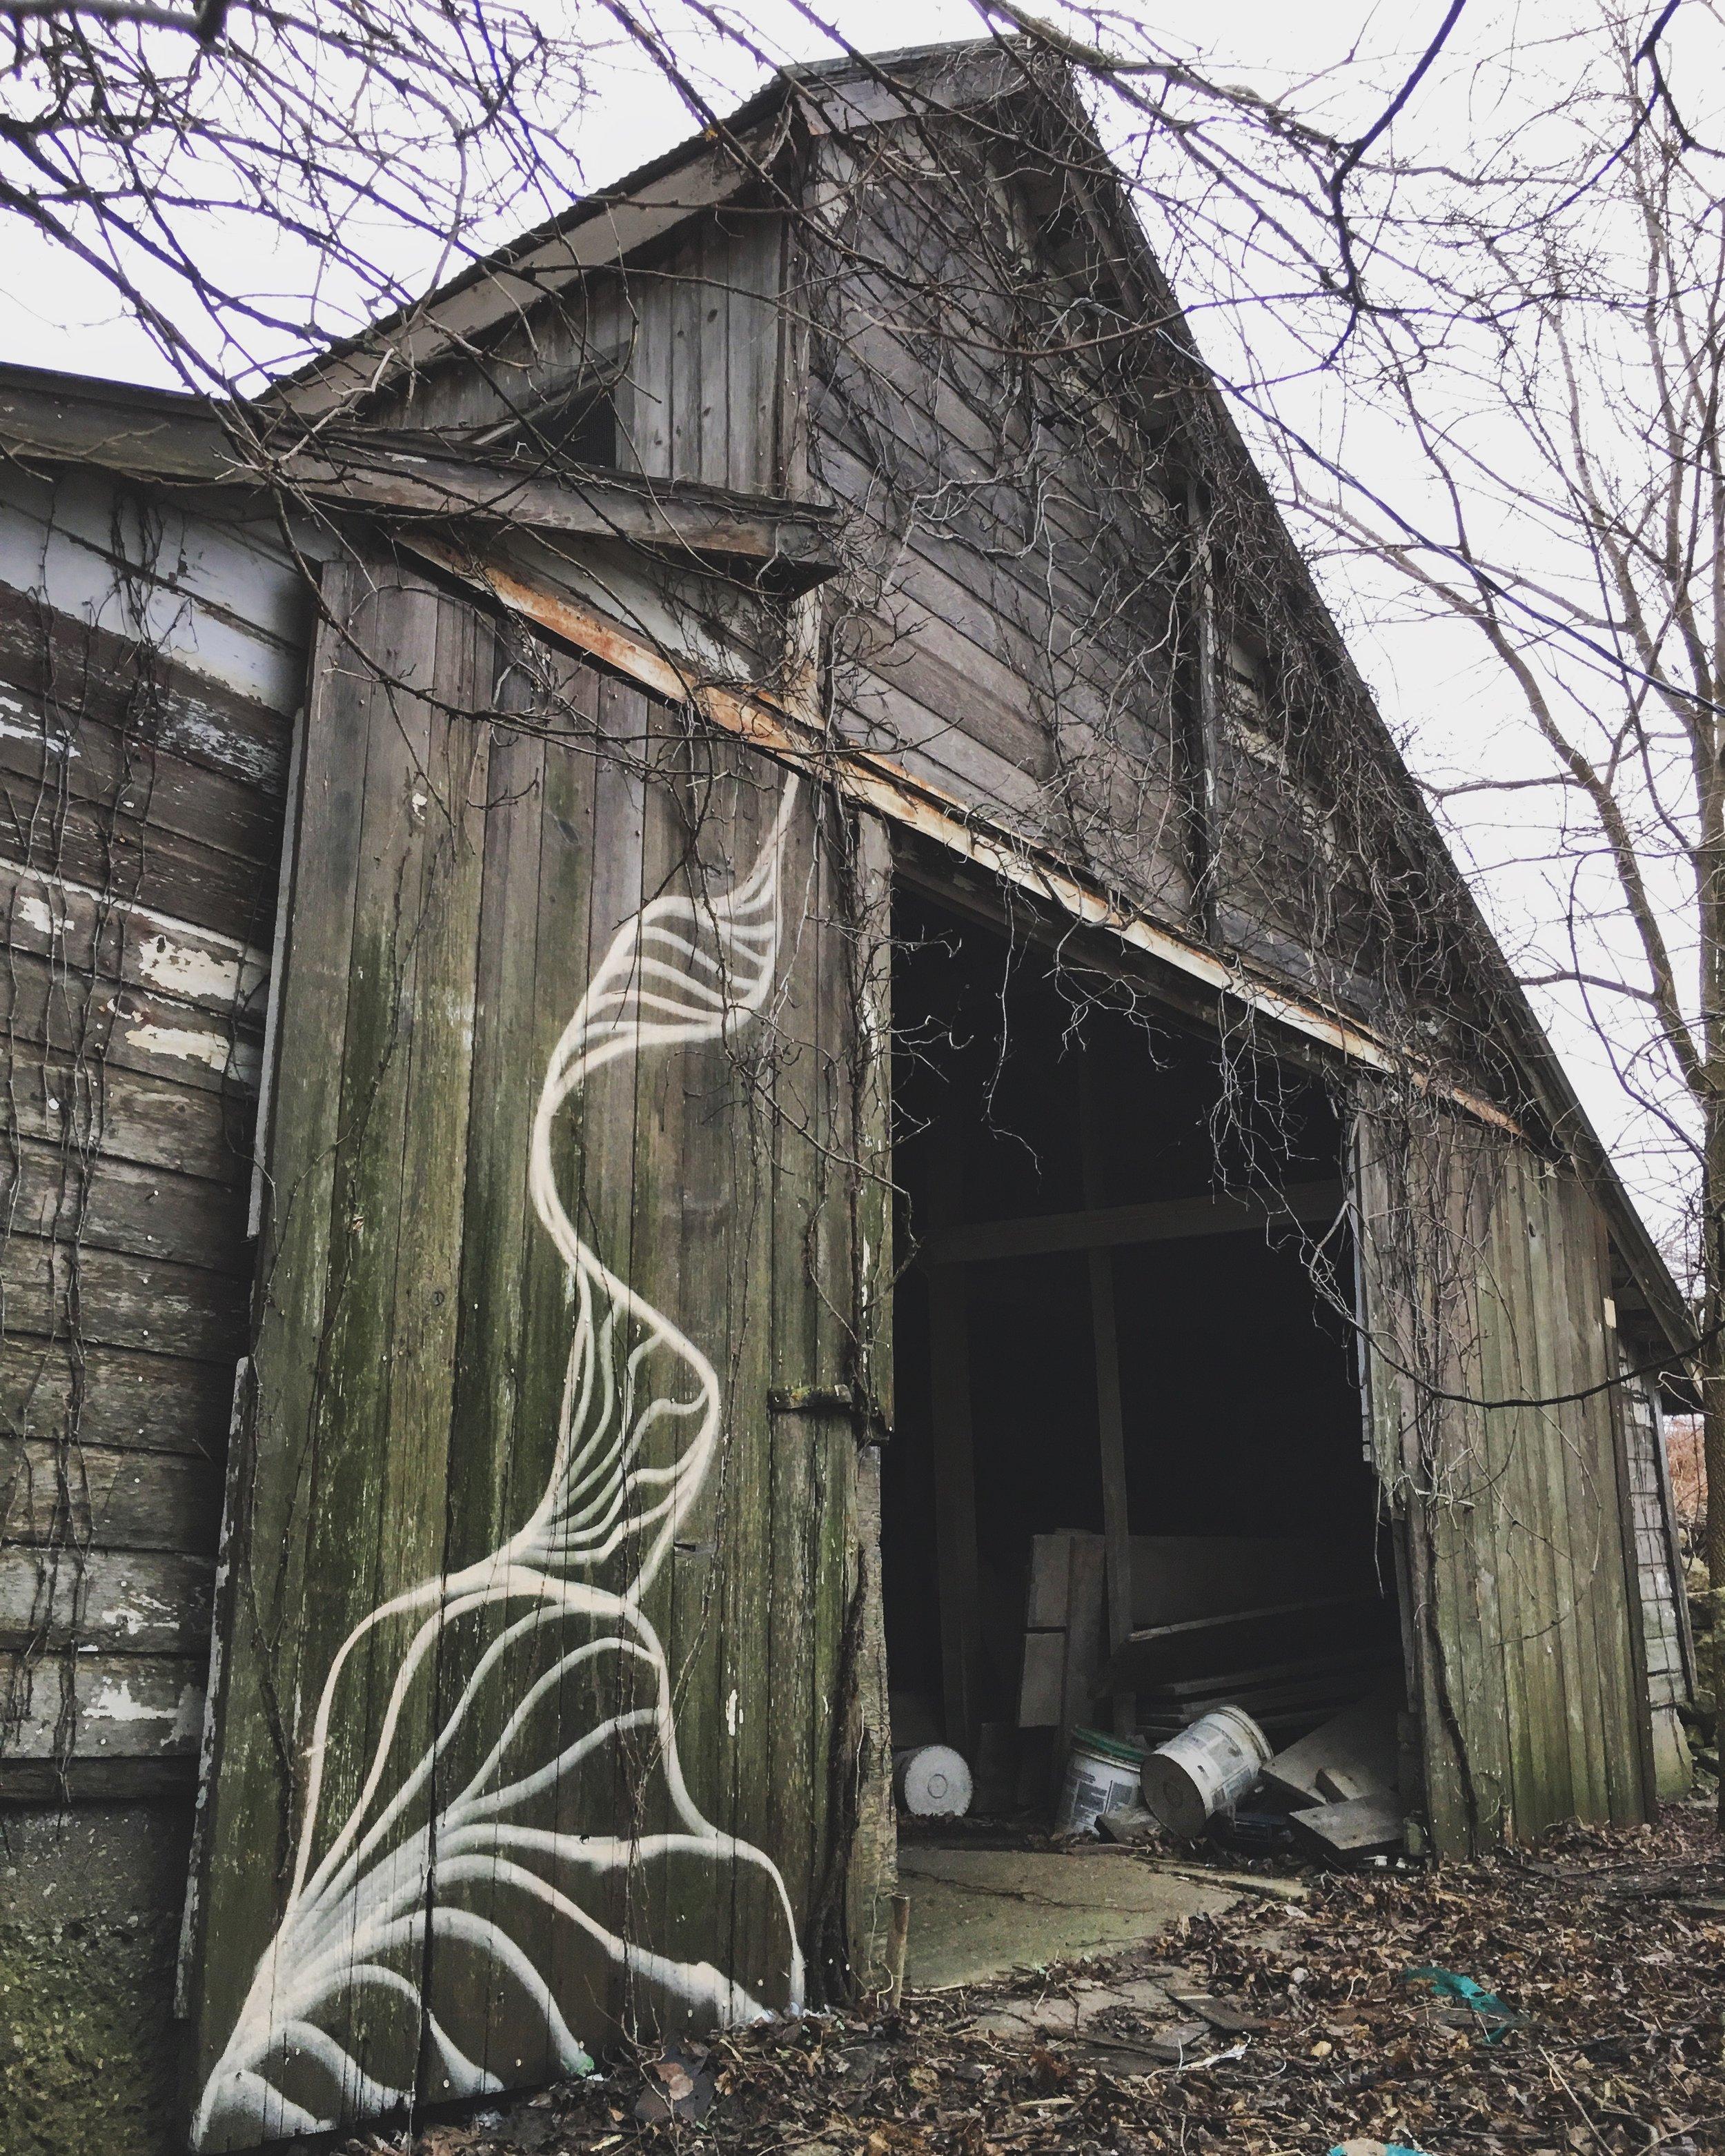 Strider Patton - Barn mural - Iowa 2017